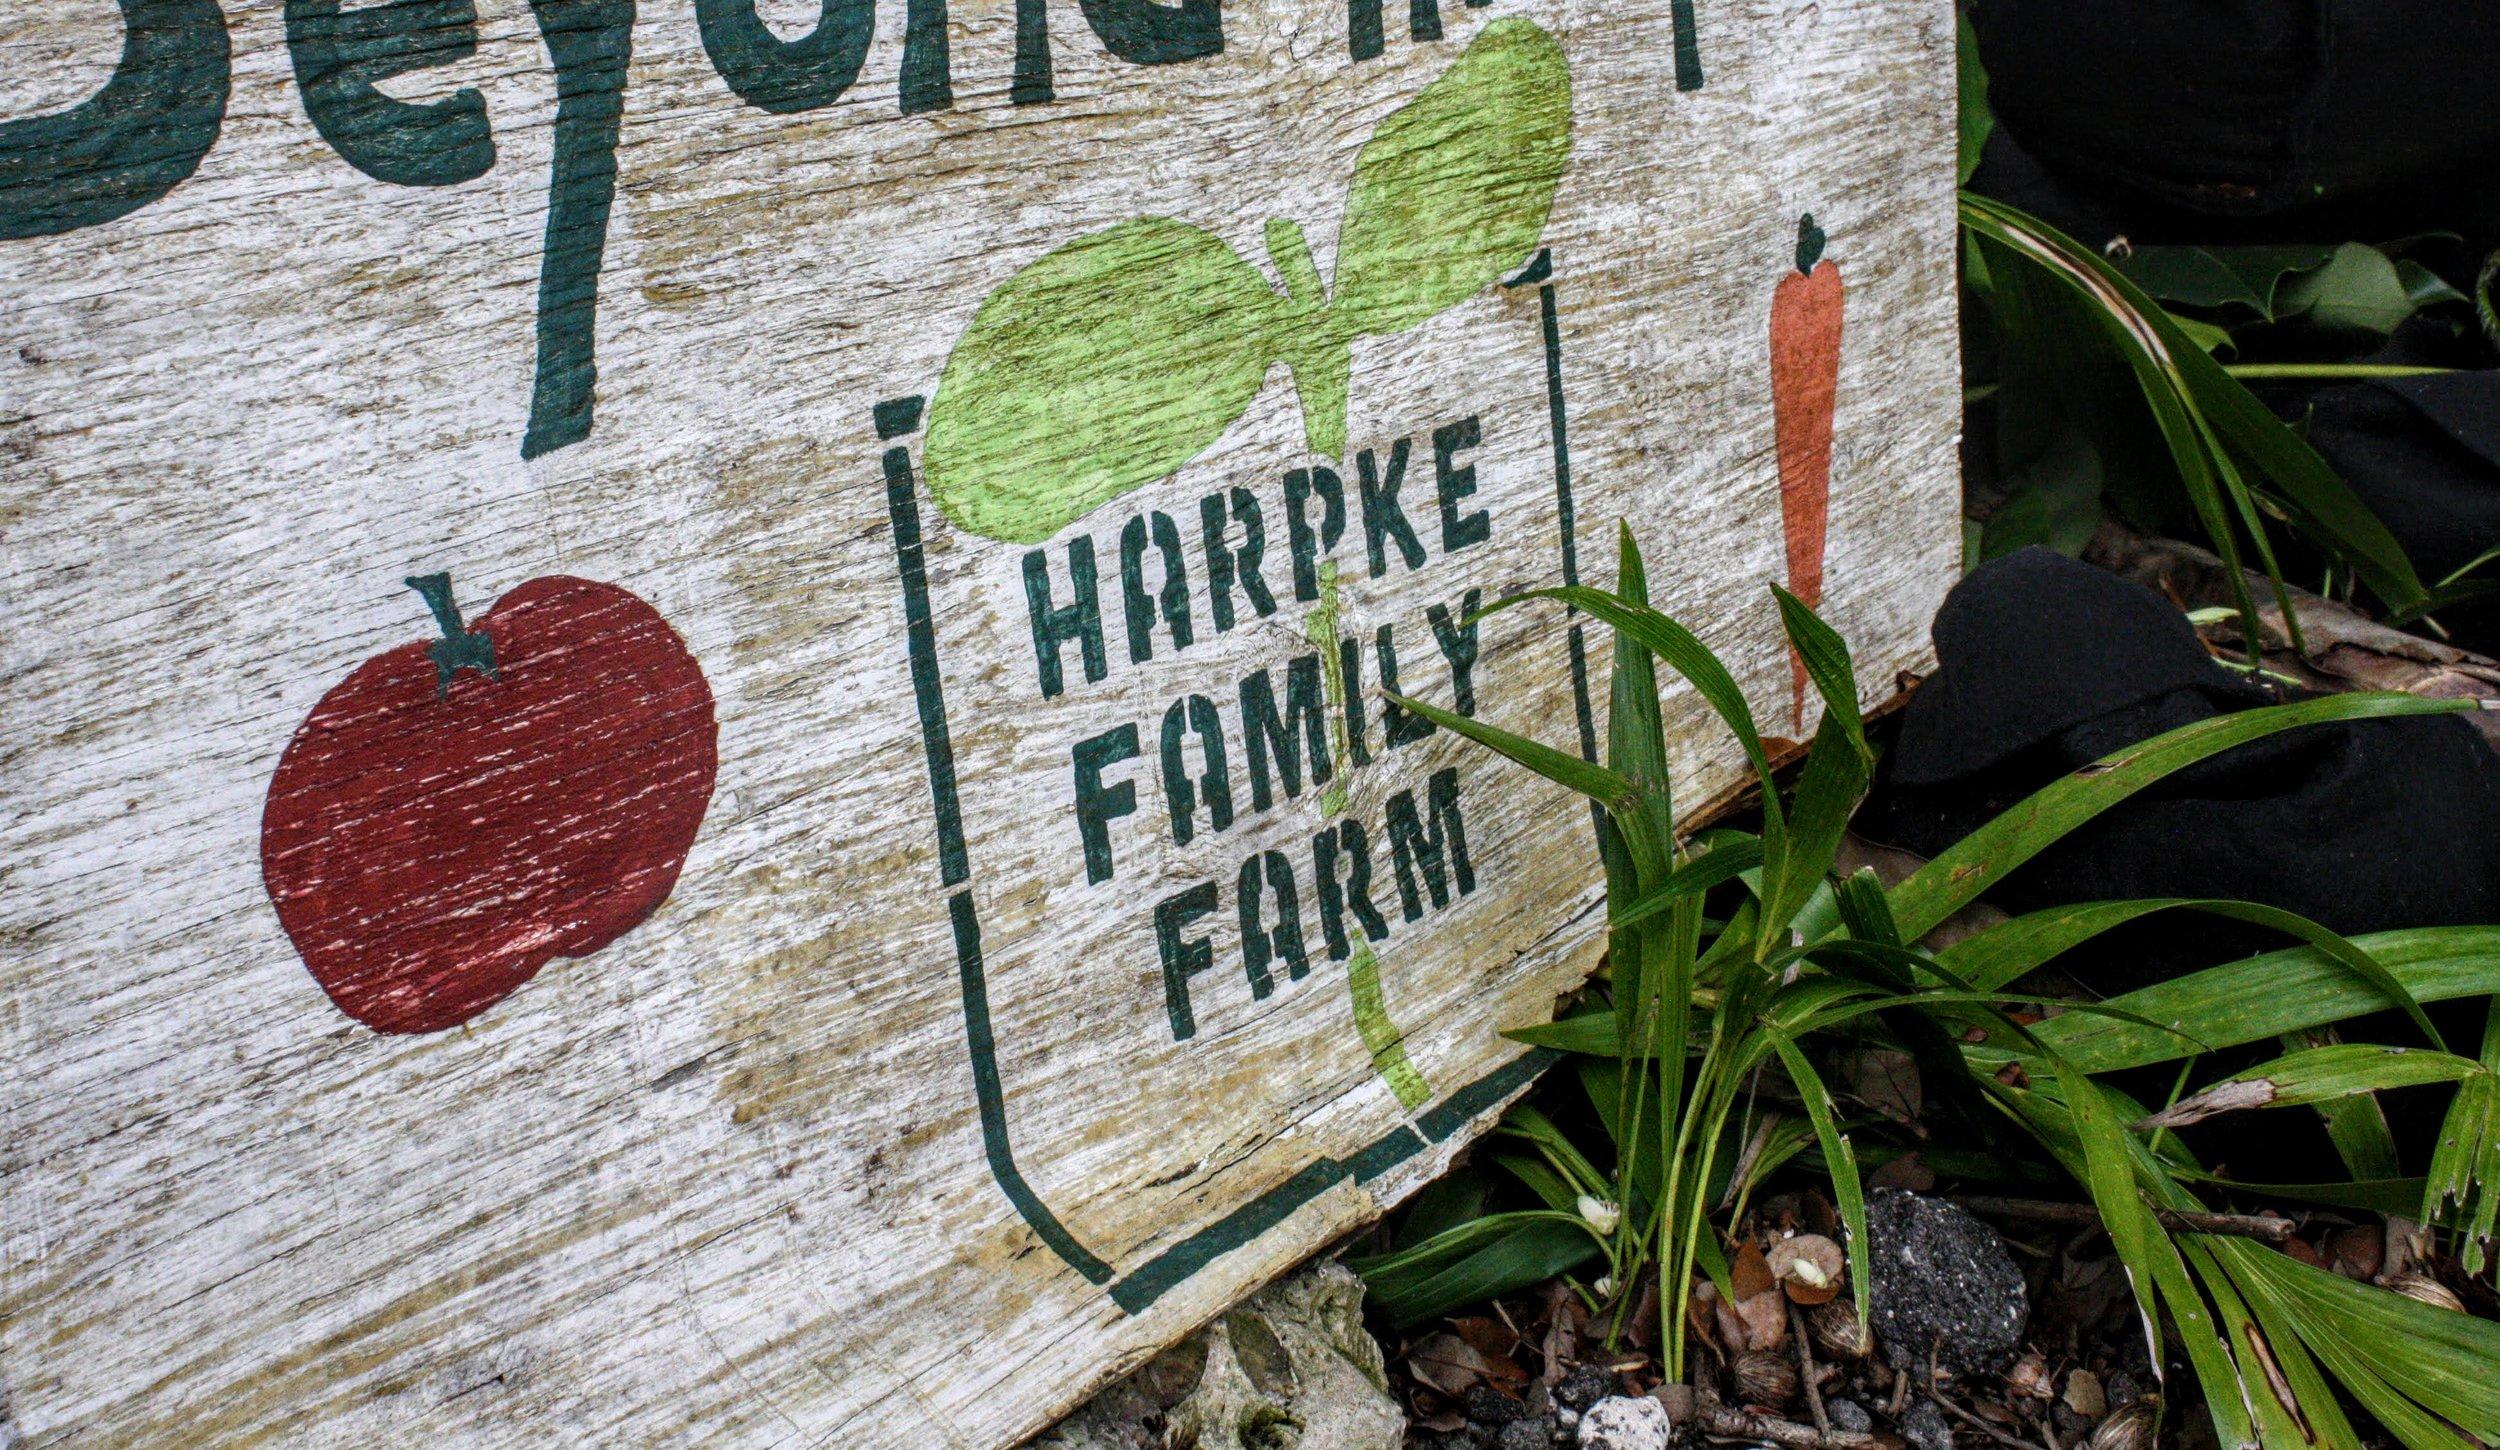 Harpke Family Farm Dania Beach